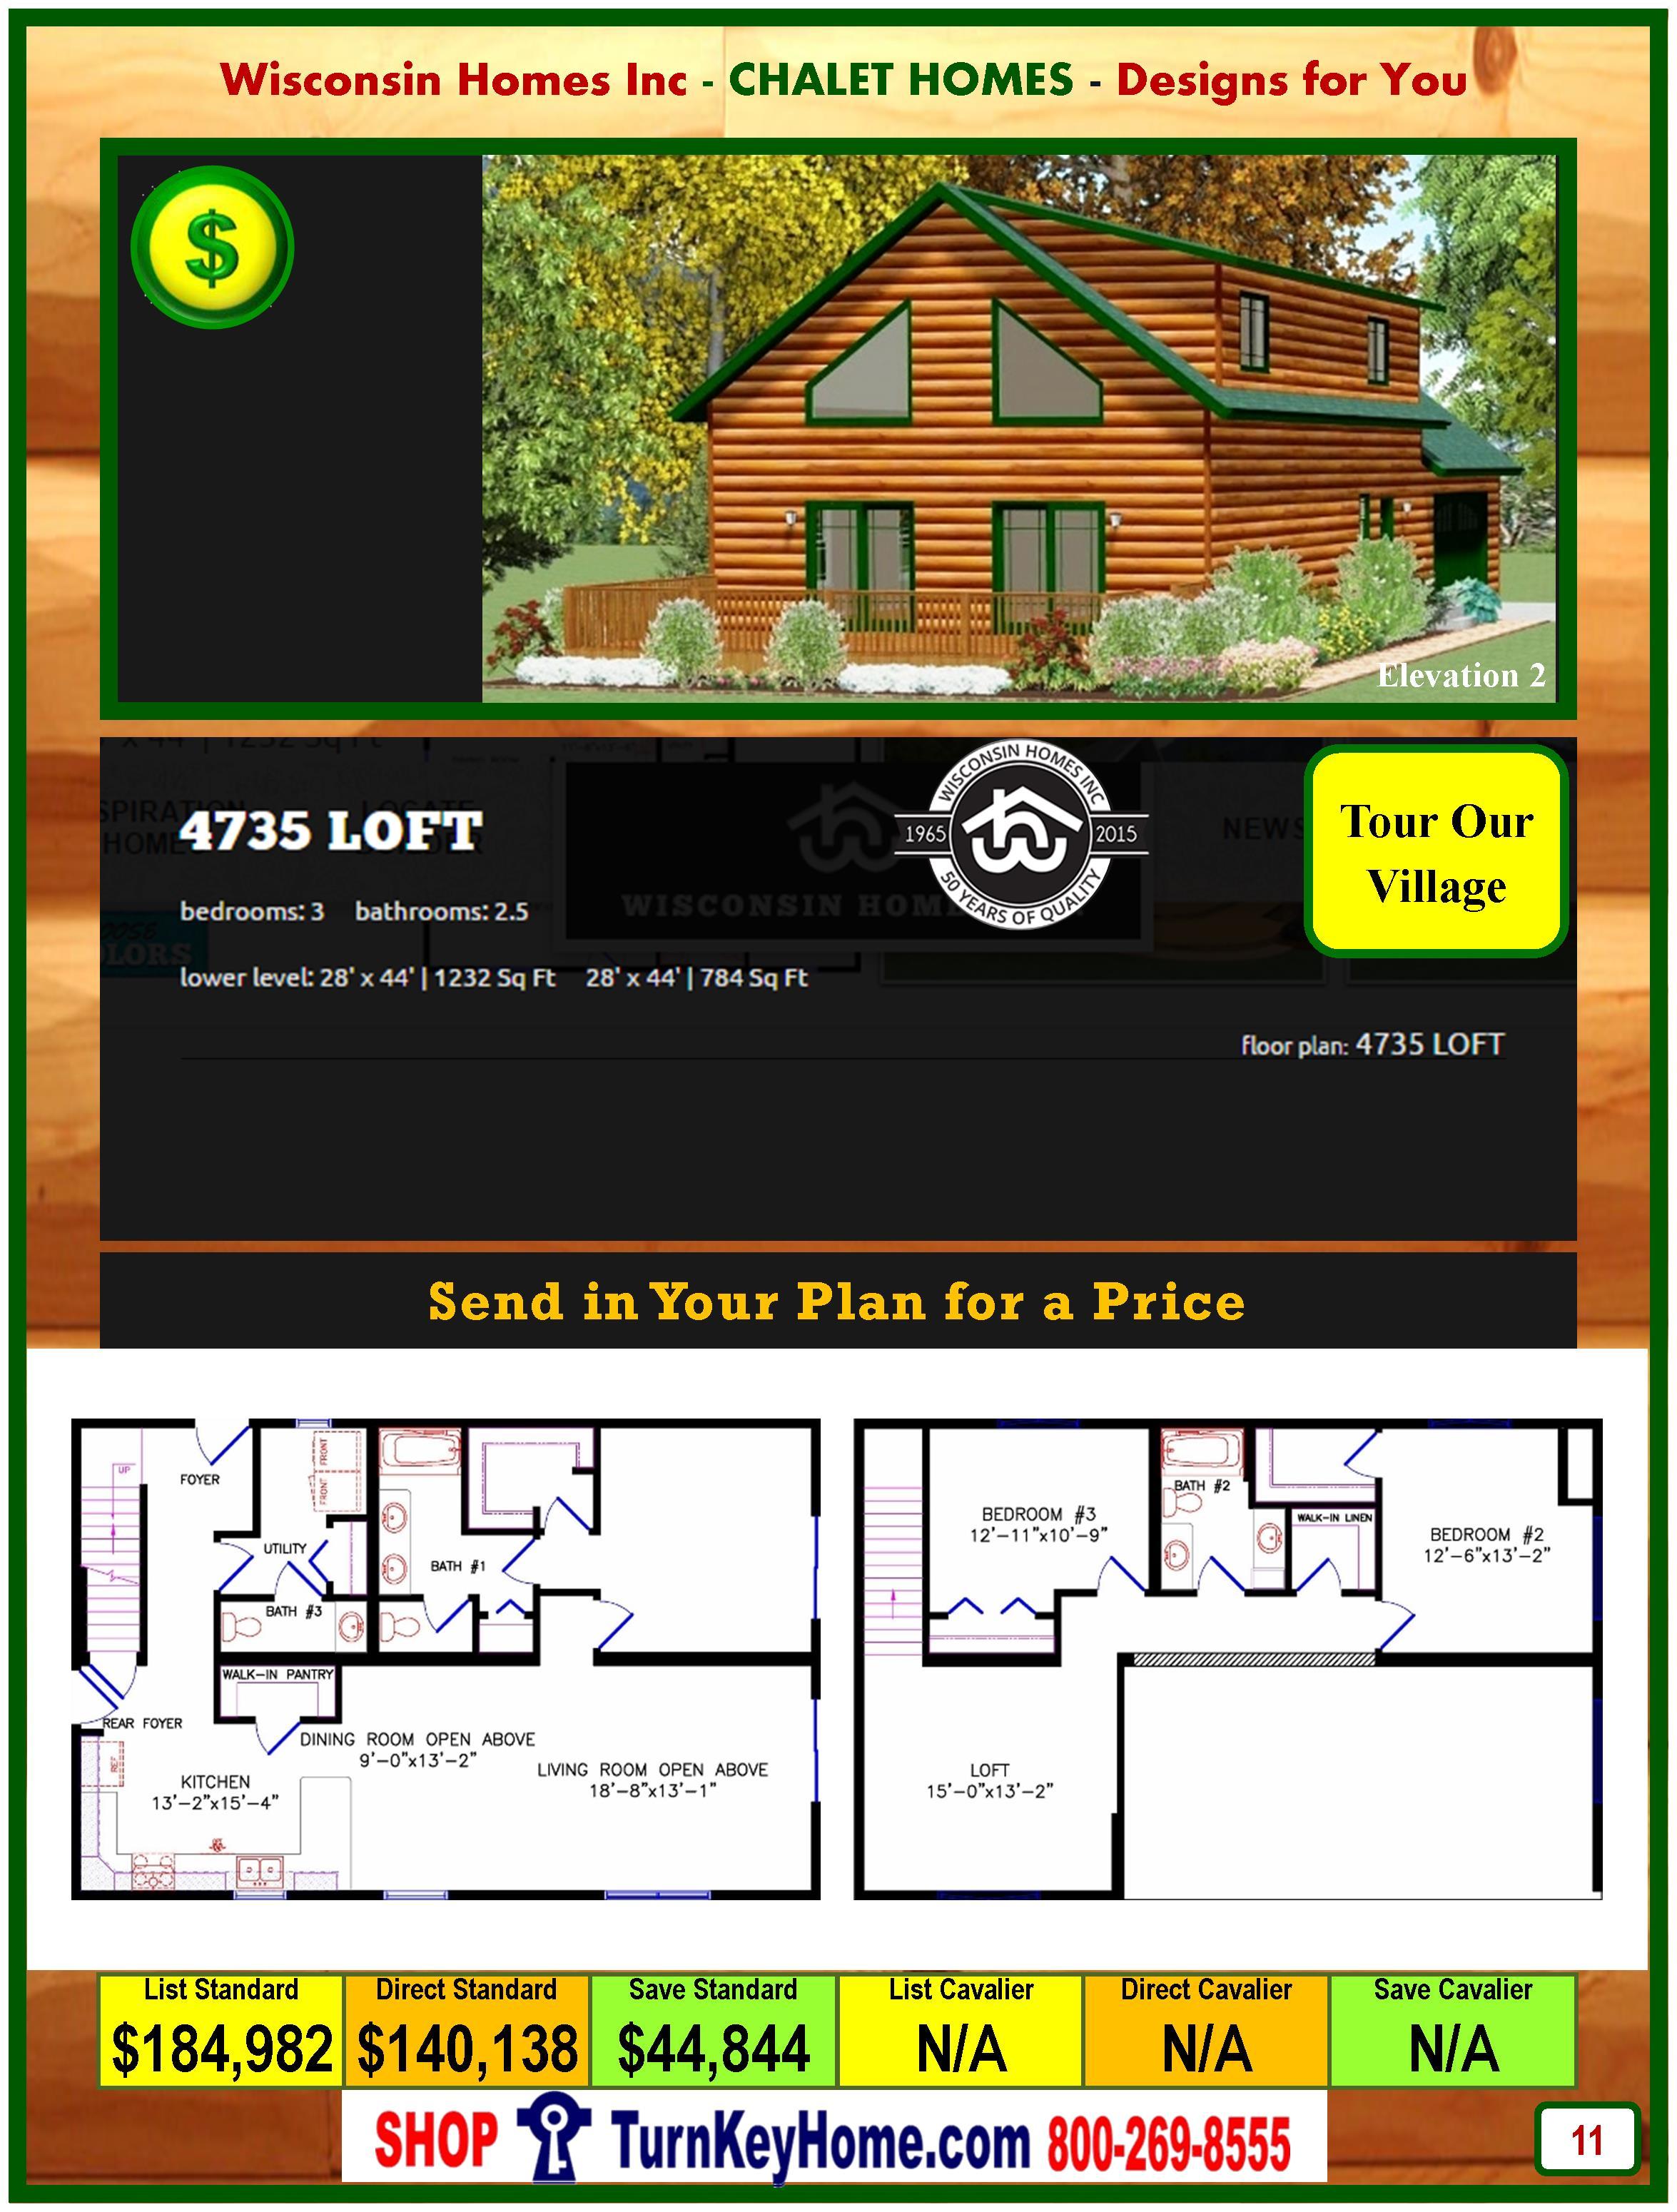 Modular.Home.Catalog.Wisconsin.Homes.Inc.Chalet.Loft.4735.P11.2.1215